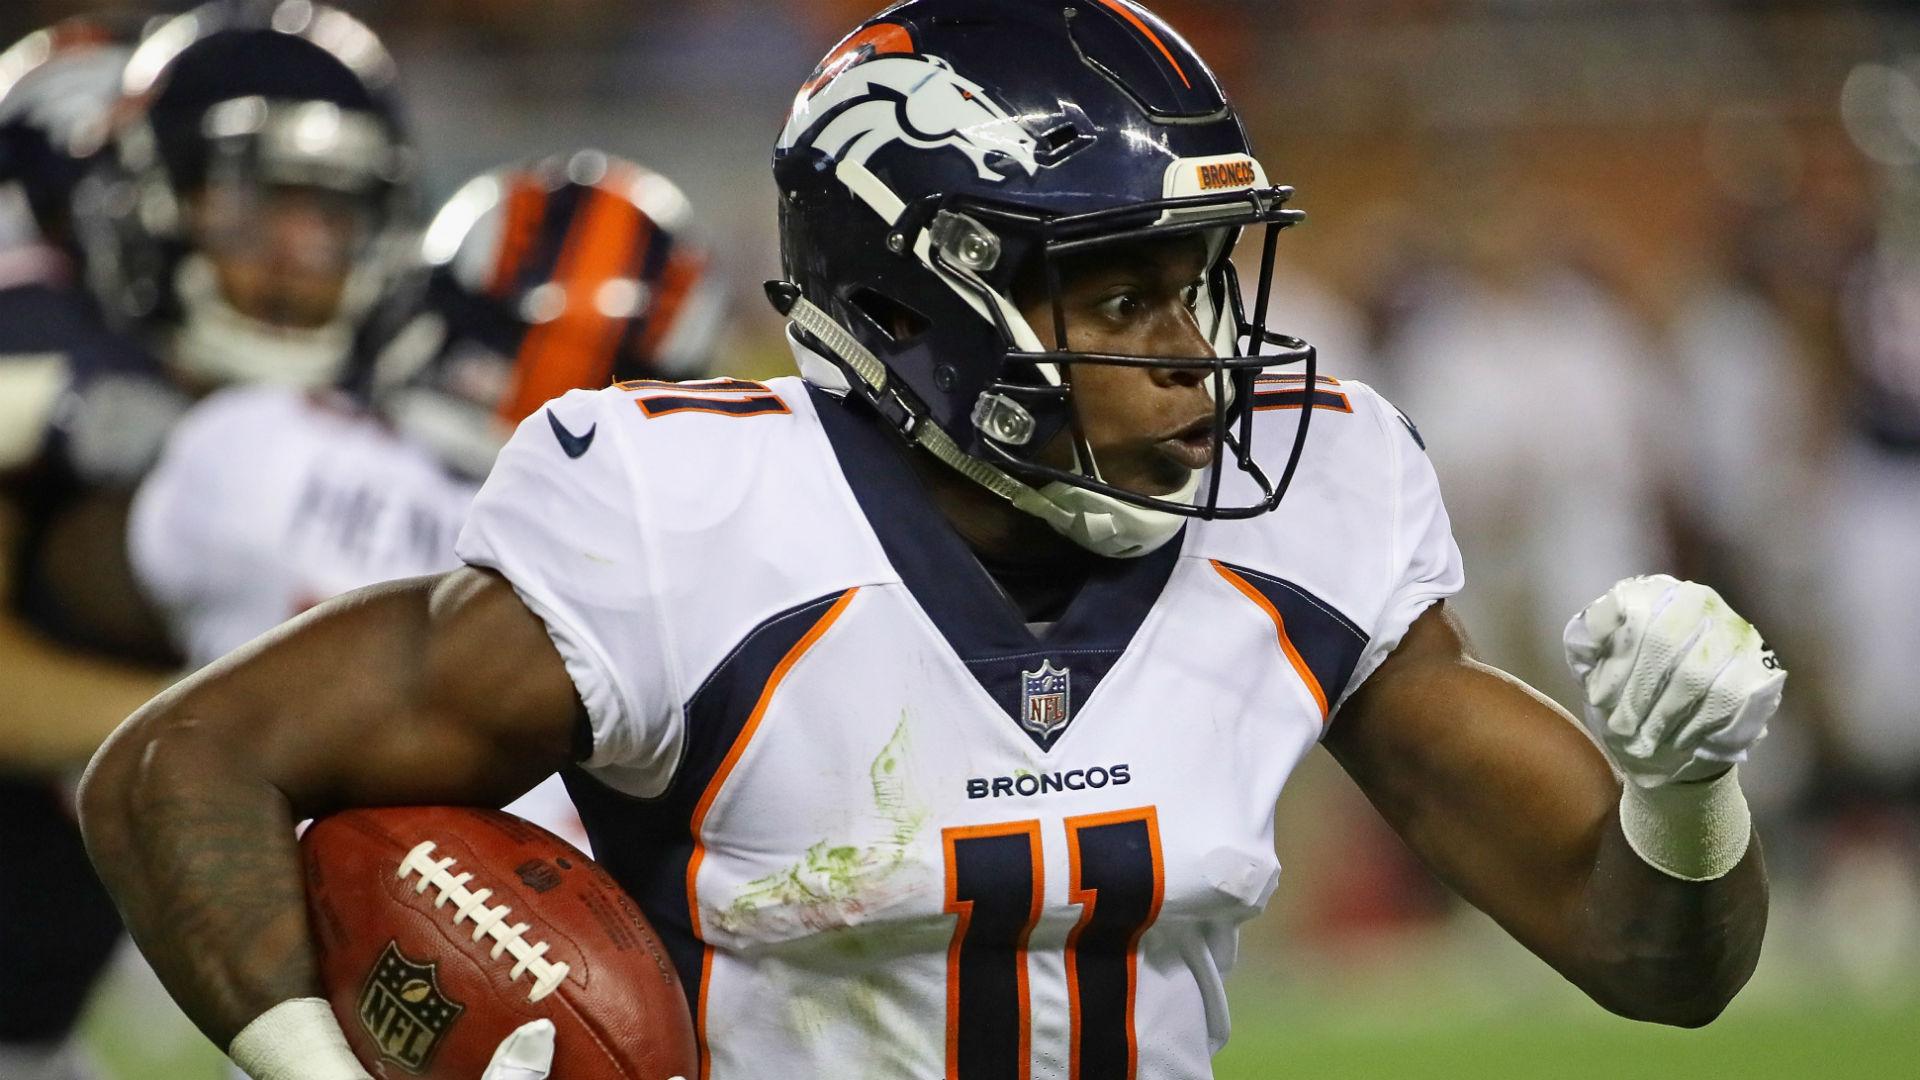 Broncos' Carlos Henderson hoping to rejoin team after strange absence